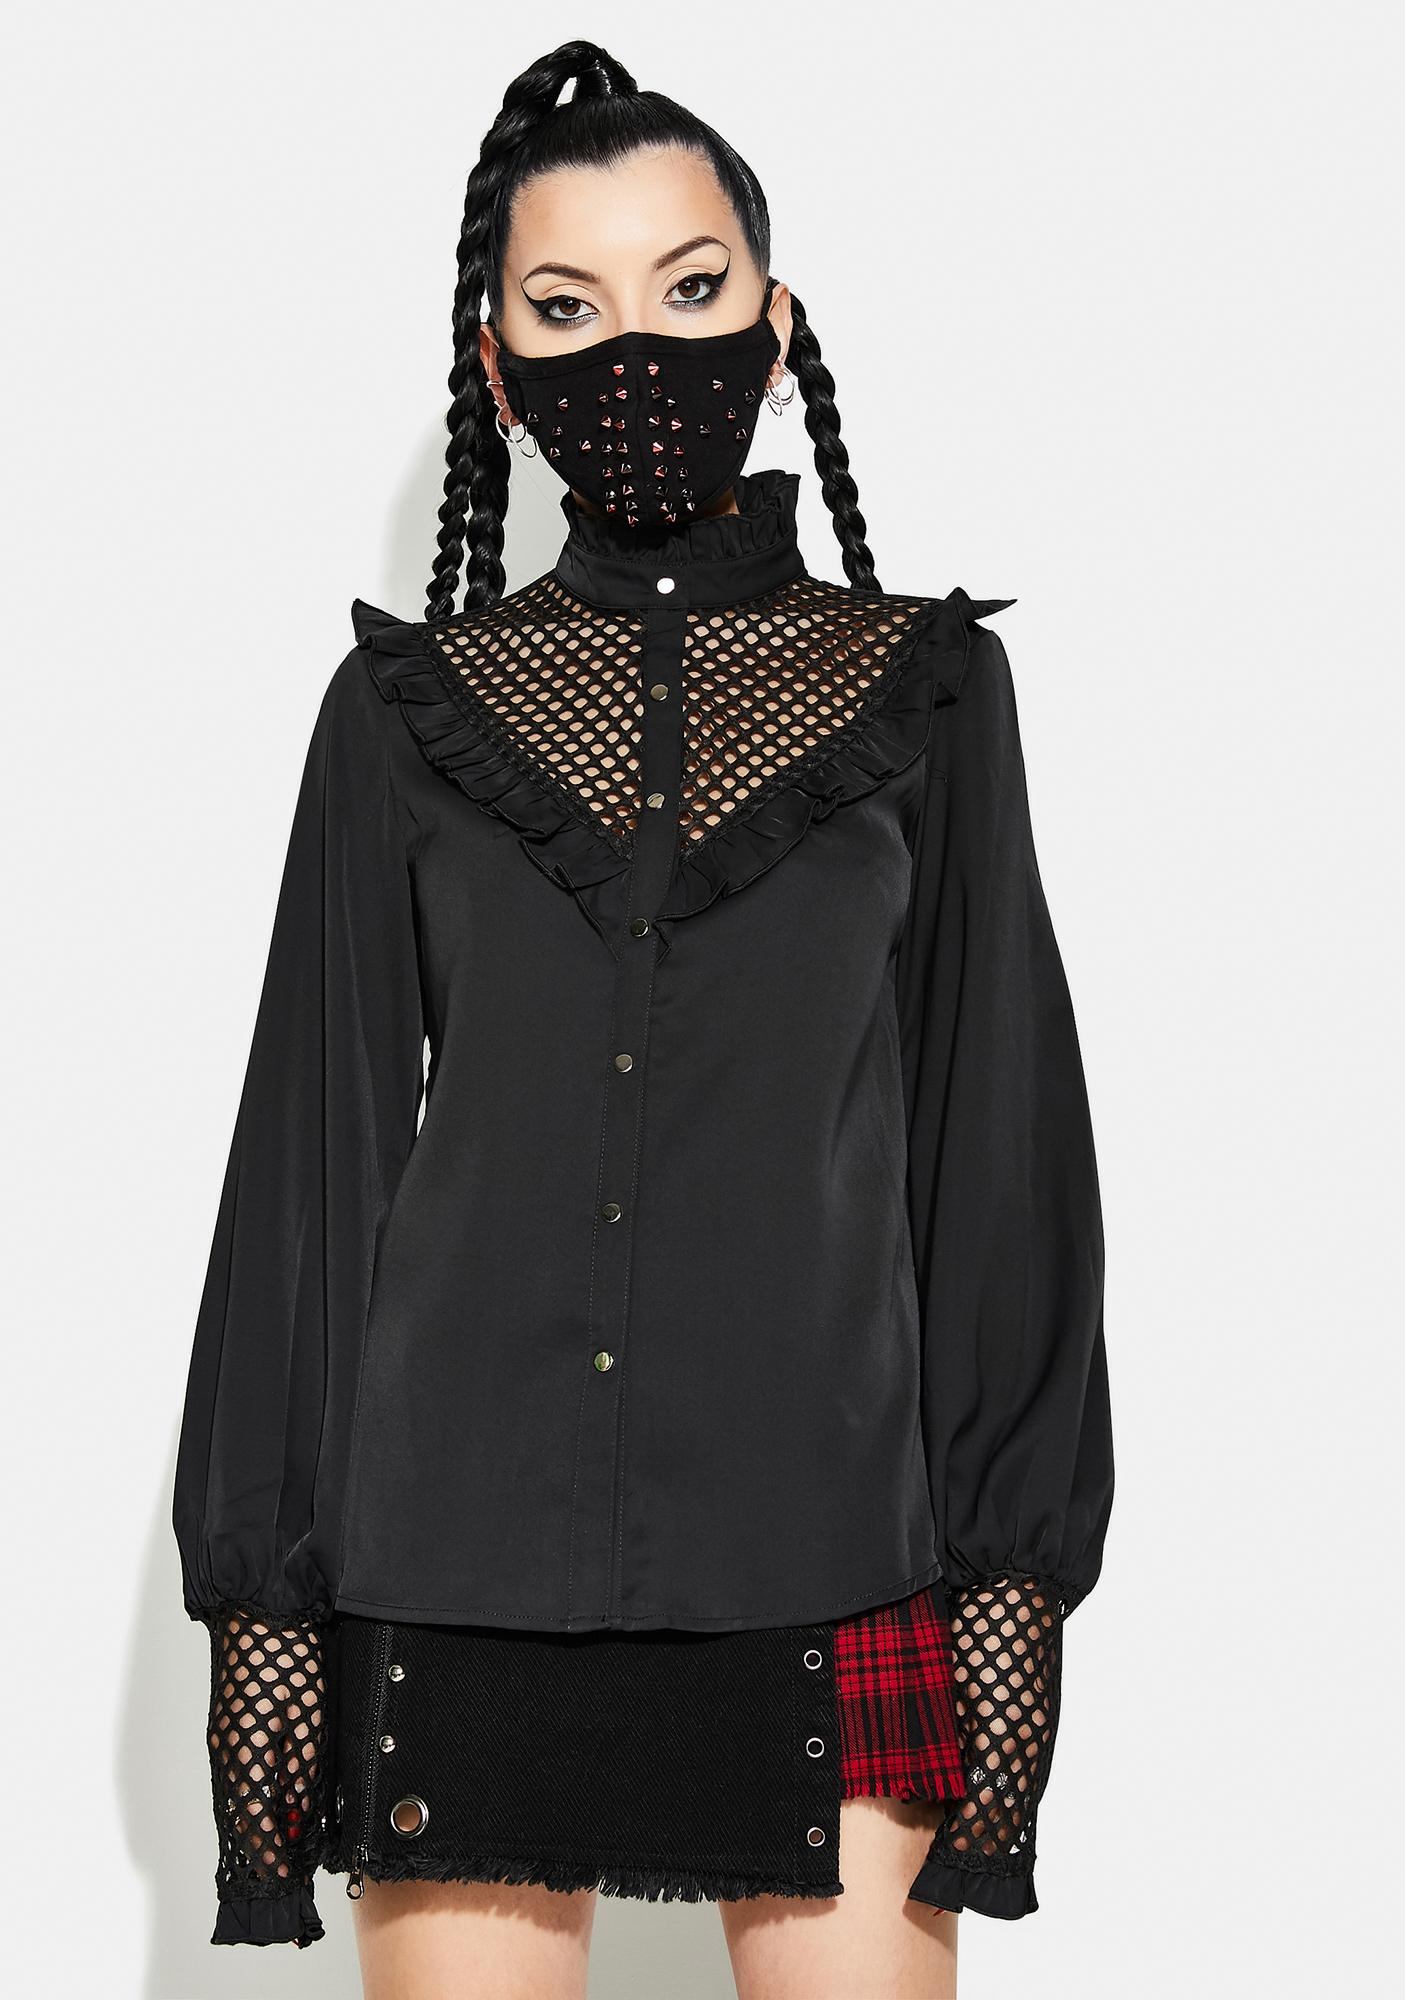 Punk Rave Gothic Style Mesh Chiffon Shirt